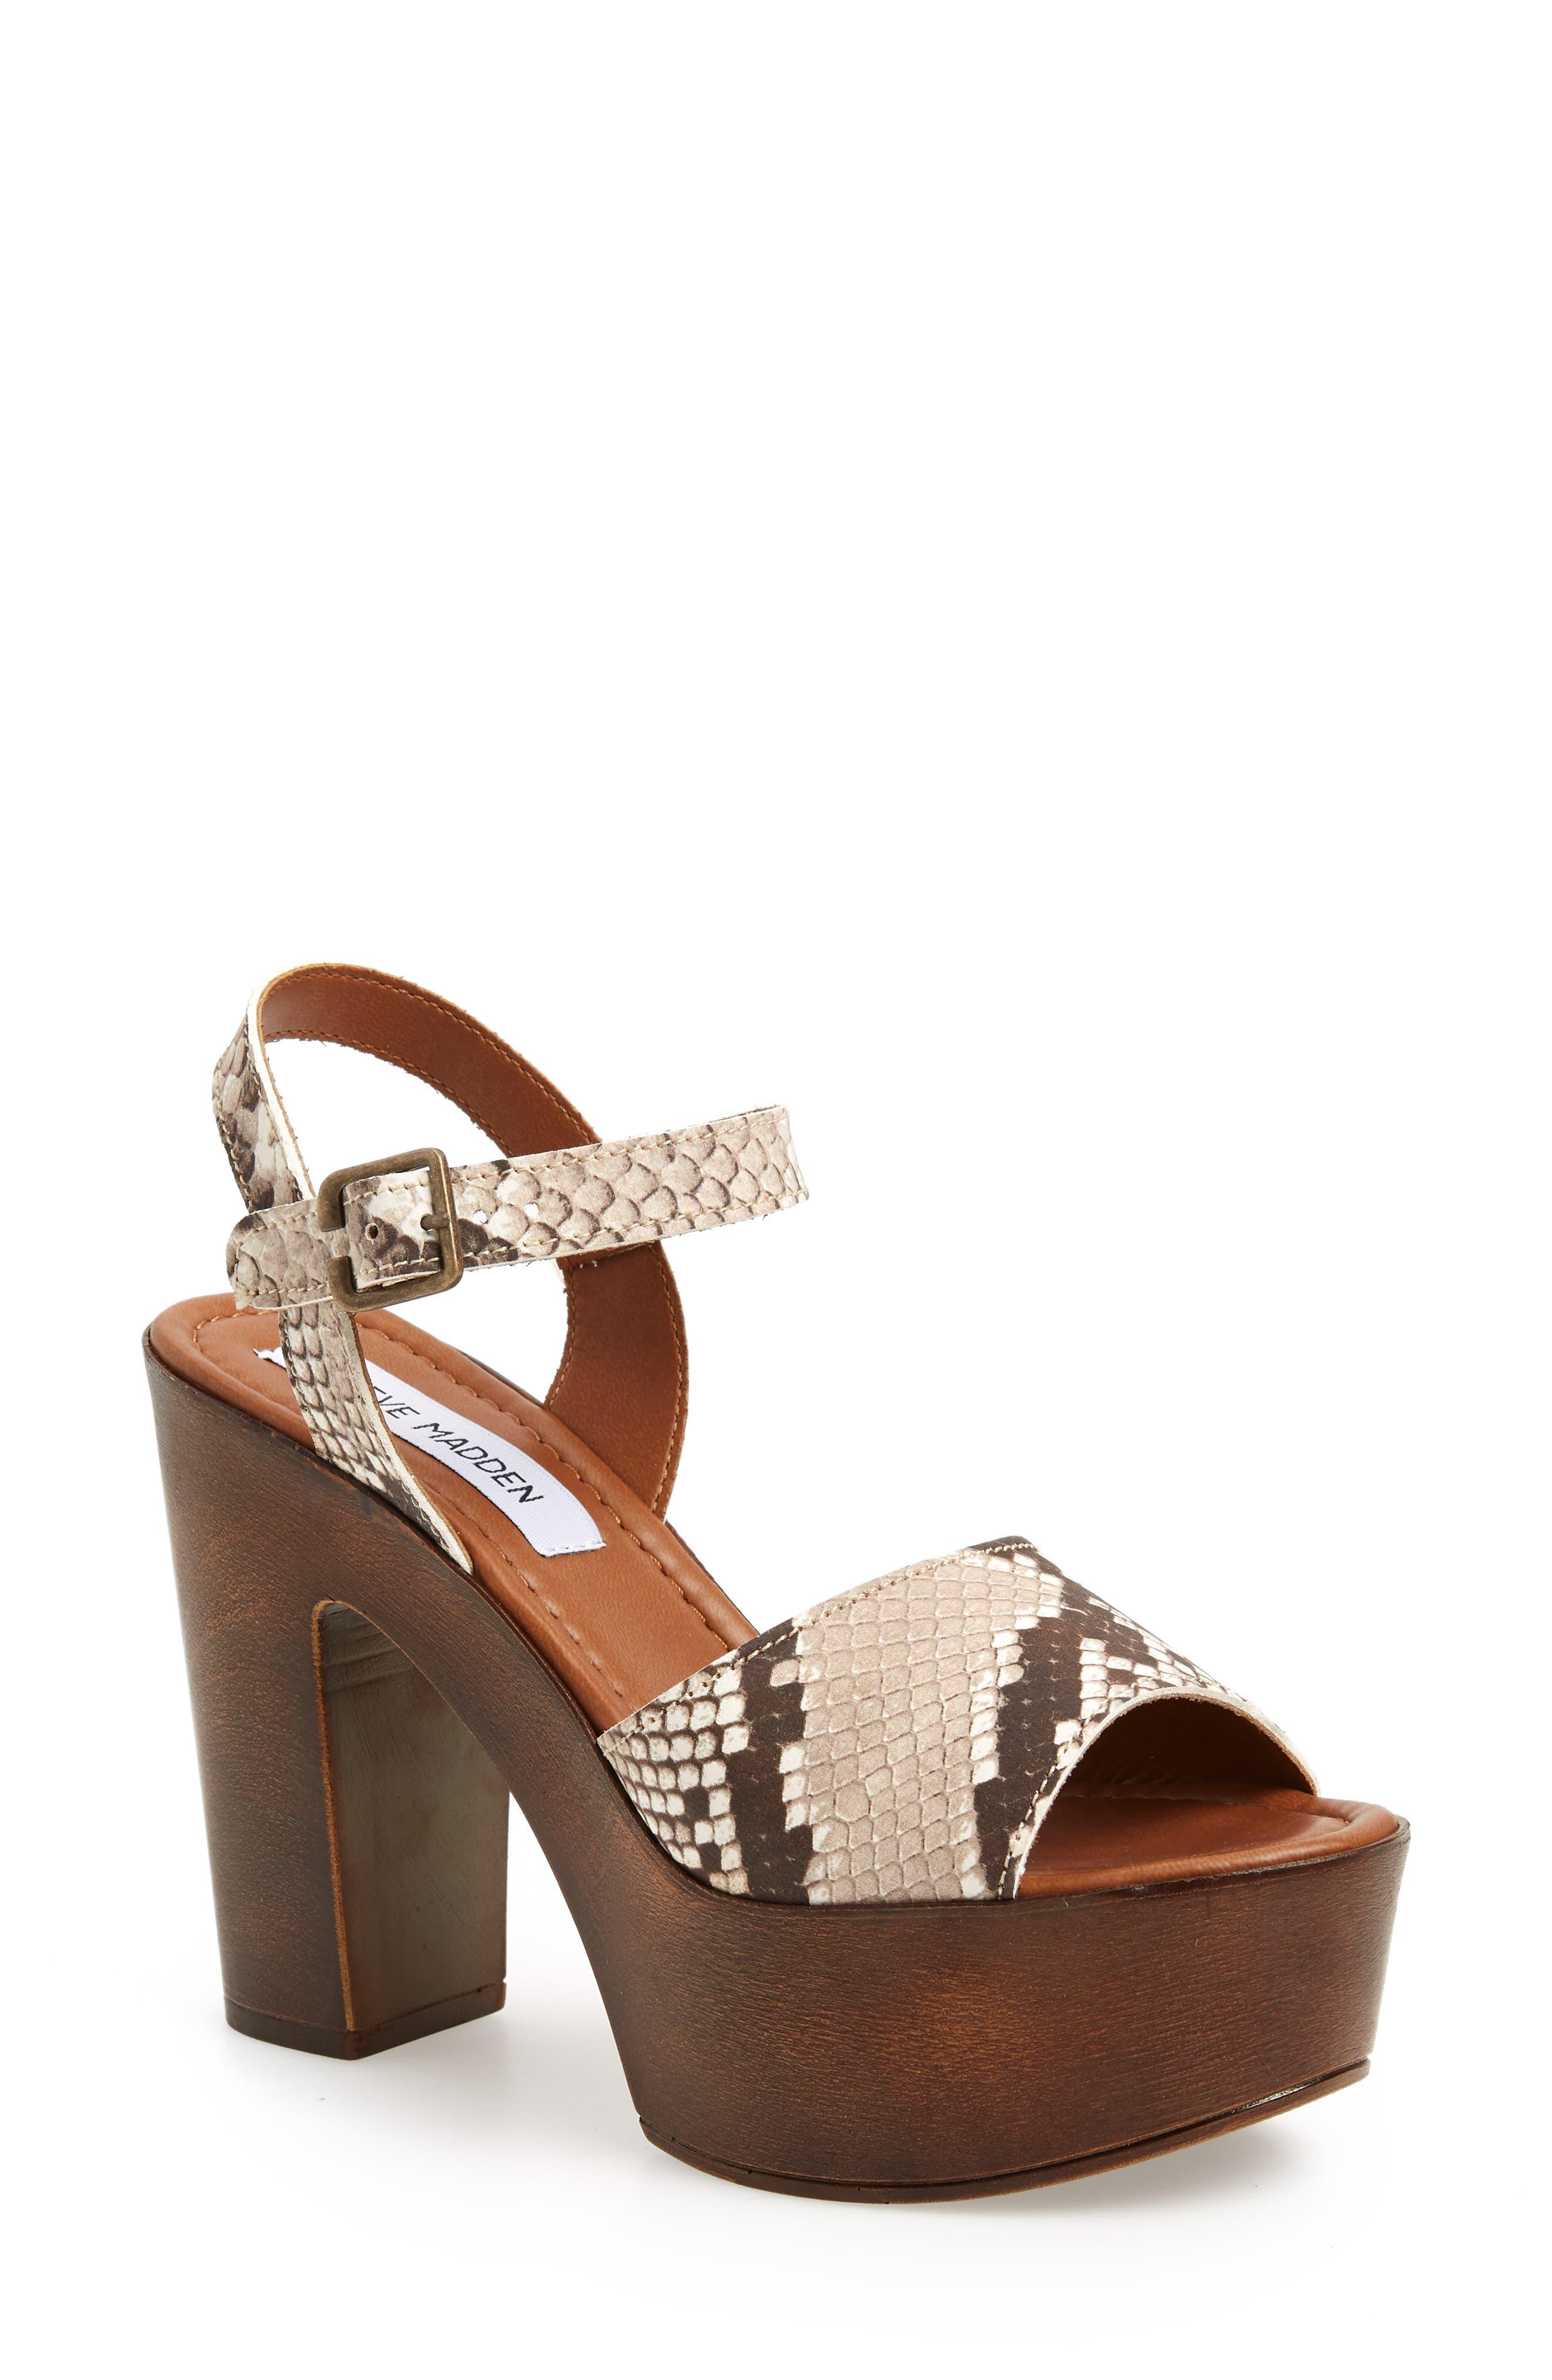 Lulla Platform Sandal,                         Main,                         color, White Reptile